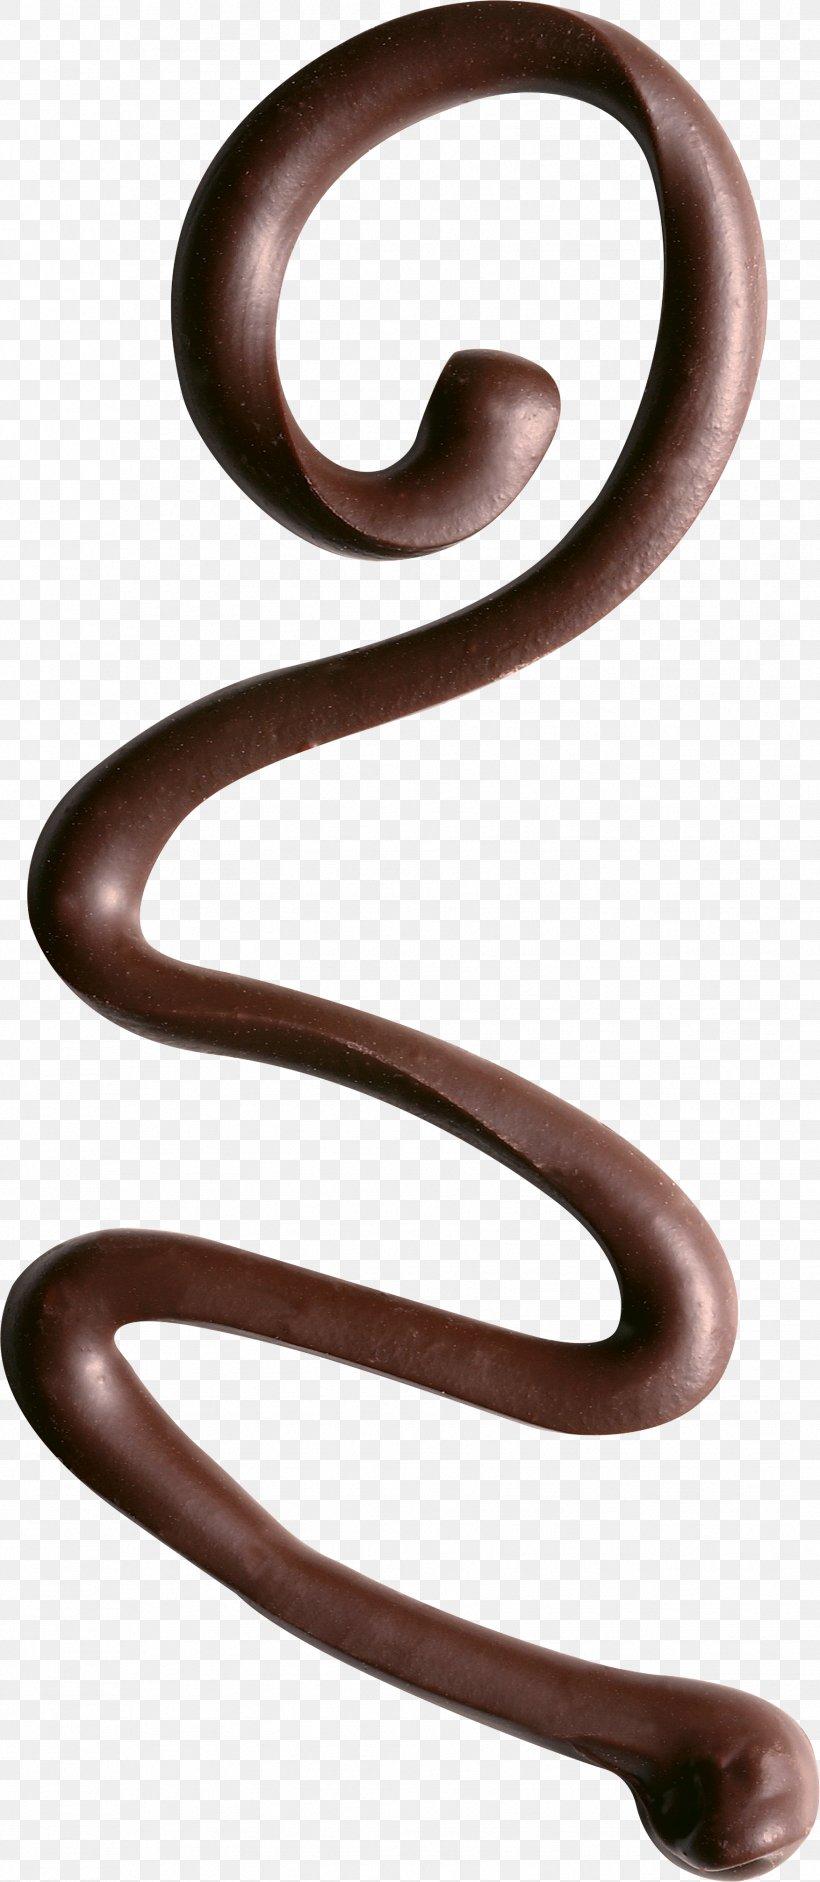 Chocolate Icon Clip Art, PNG, 1754x4027px, Ice Cream, Cake, Chocolate, Chocolate Bar, Chocolate Cake Download Free